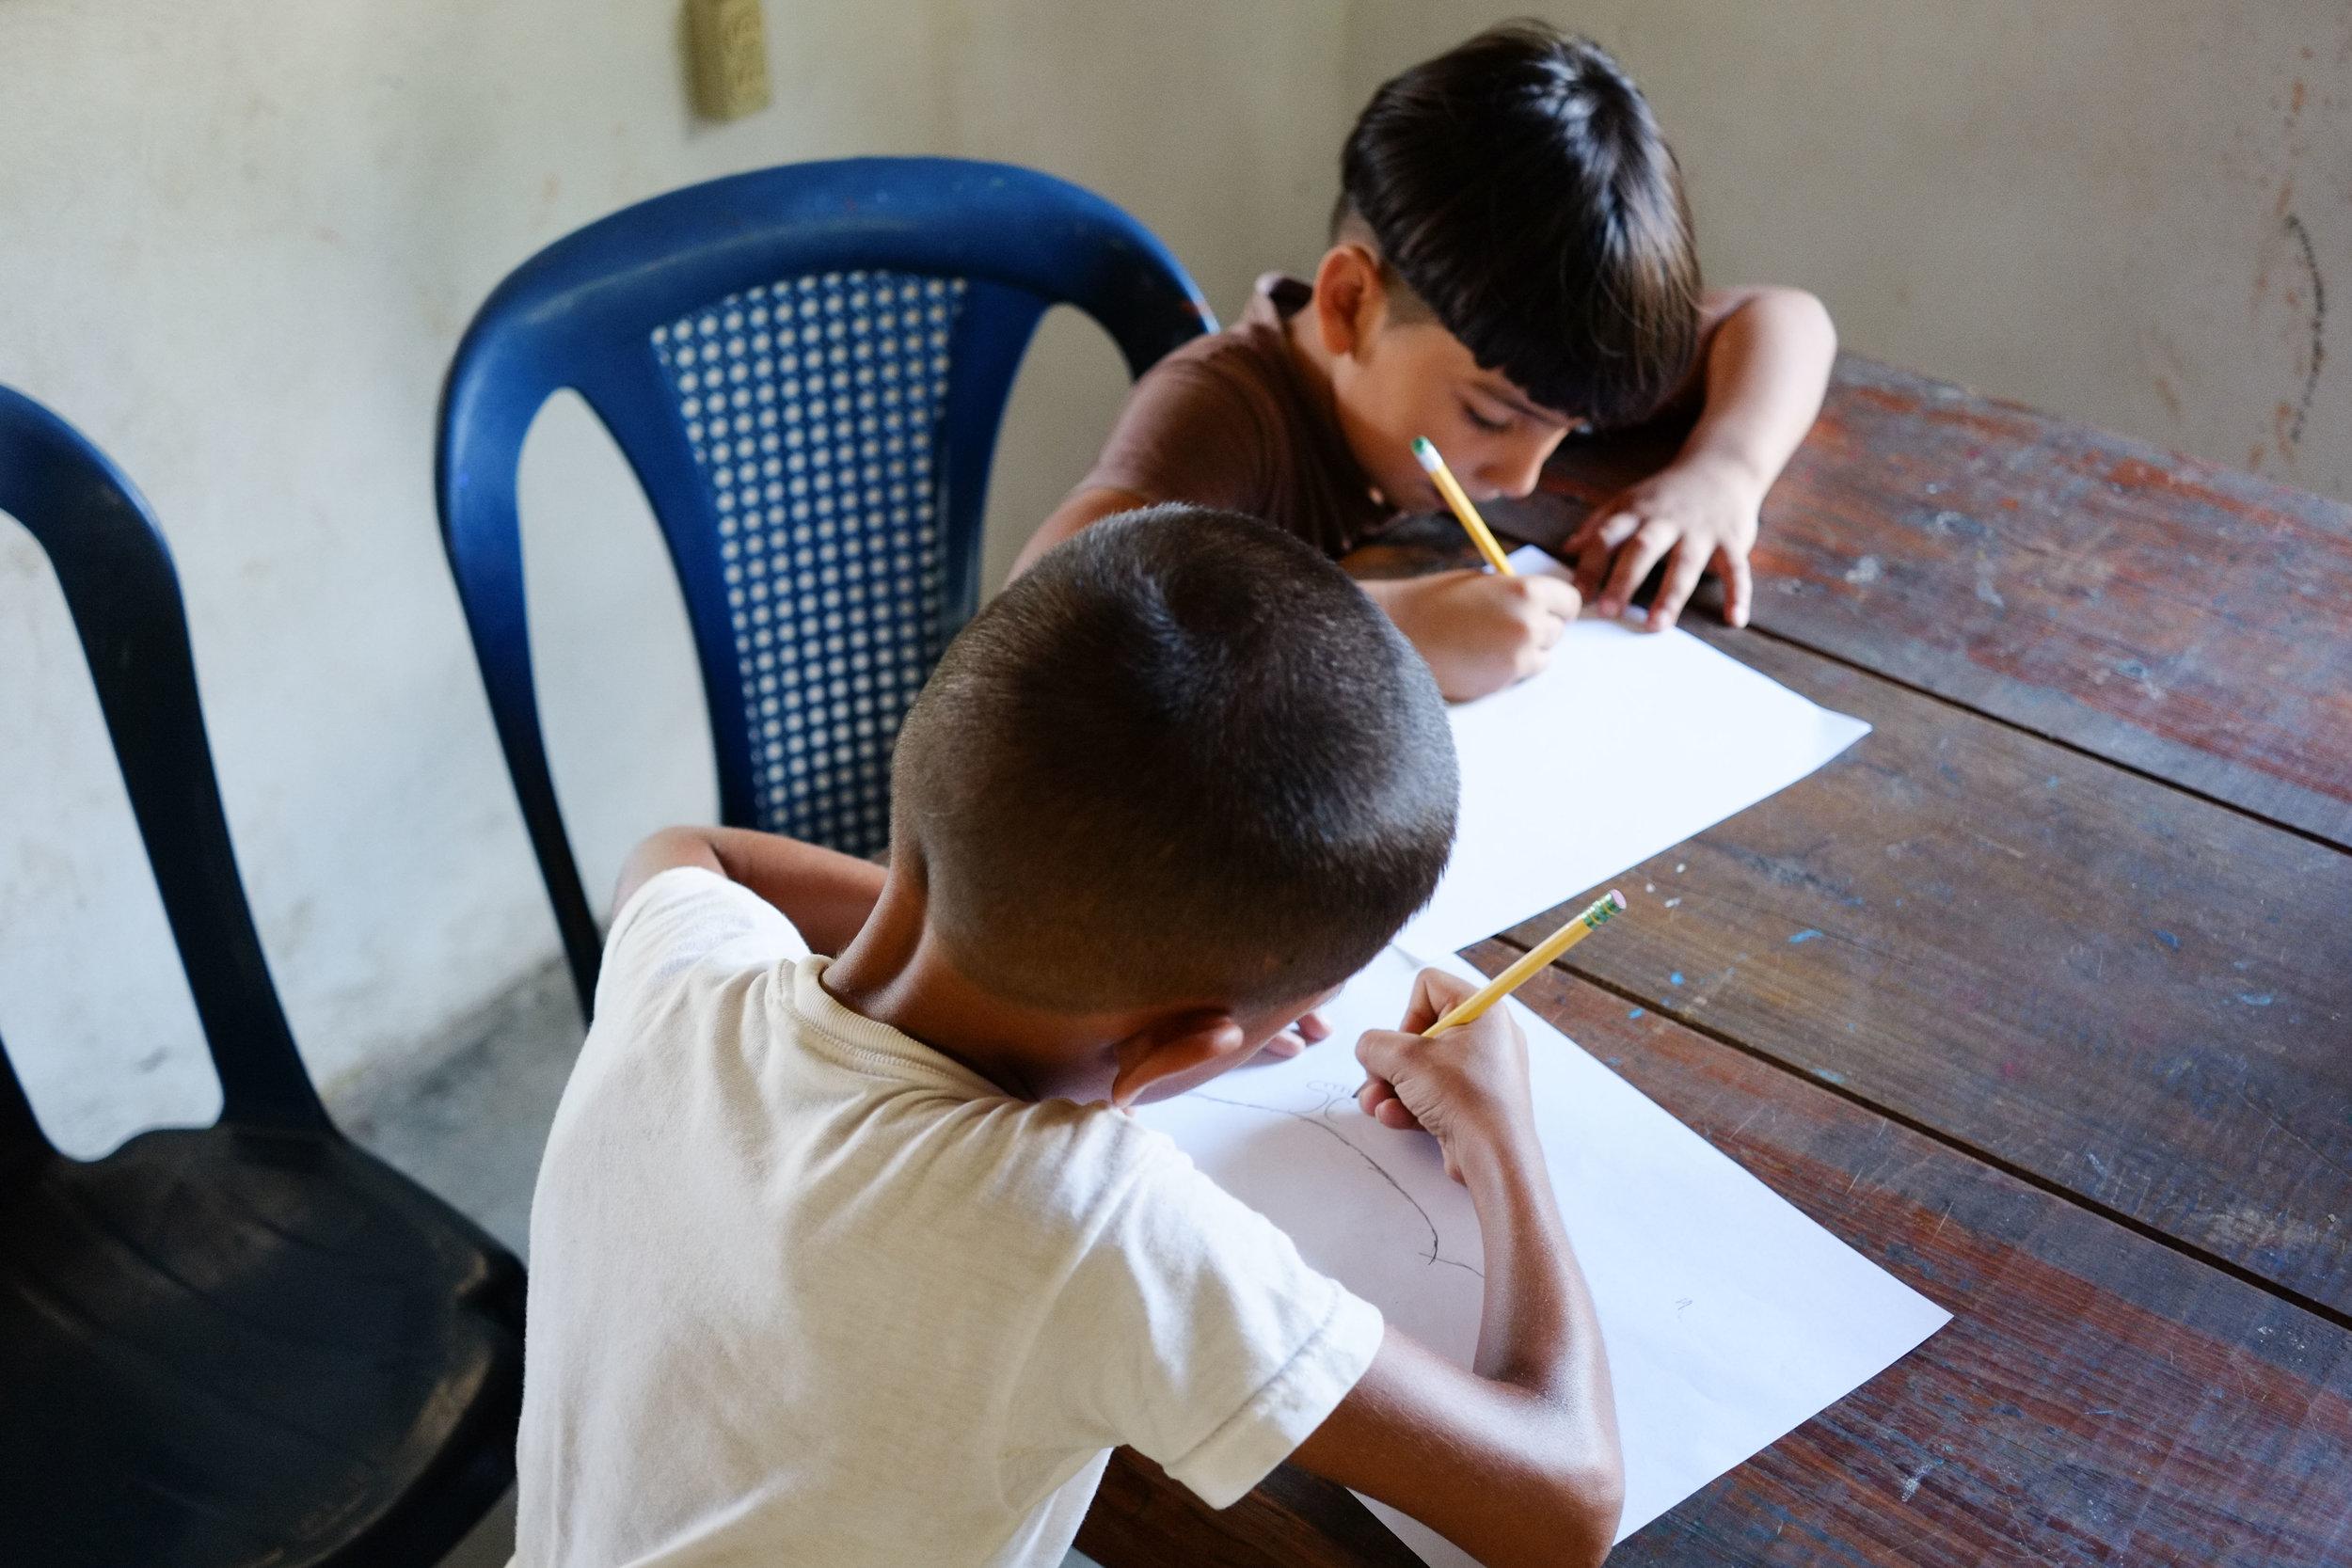 Photo by John Arthur Brown for Honduras Child Alliance